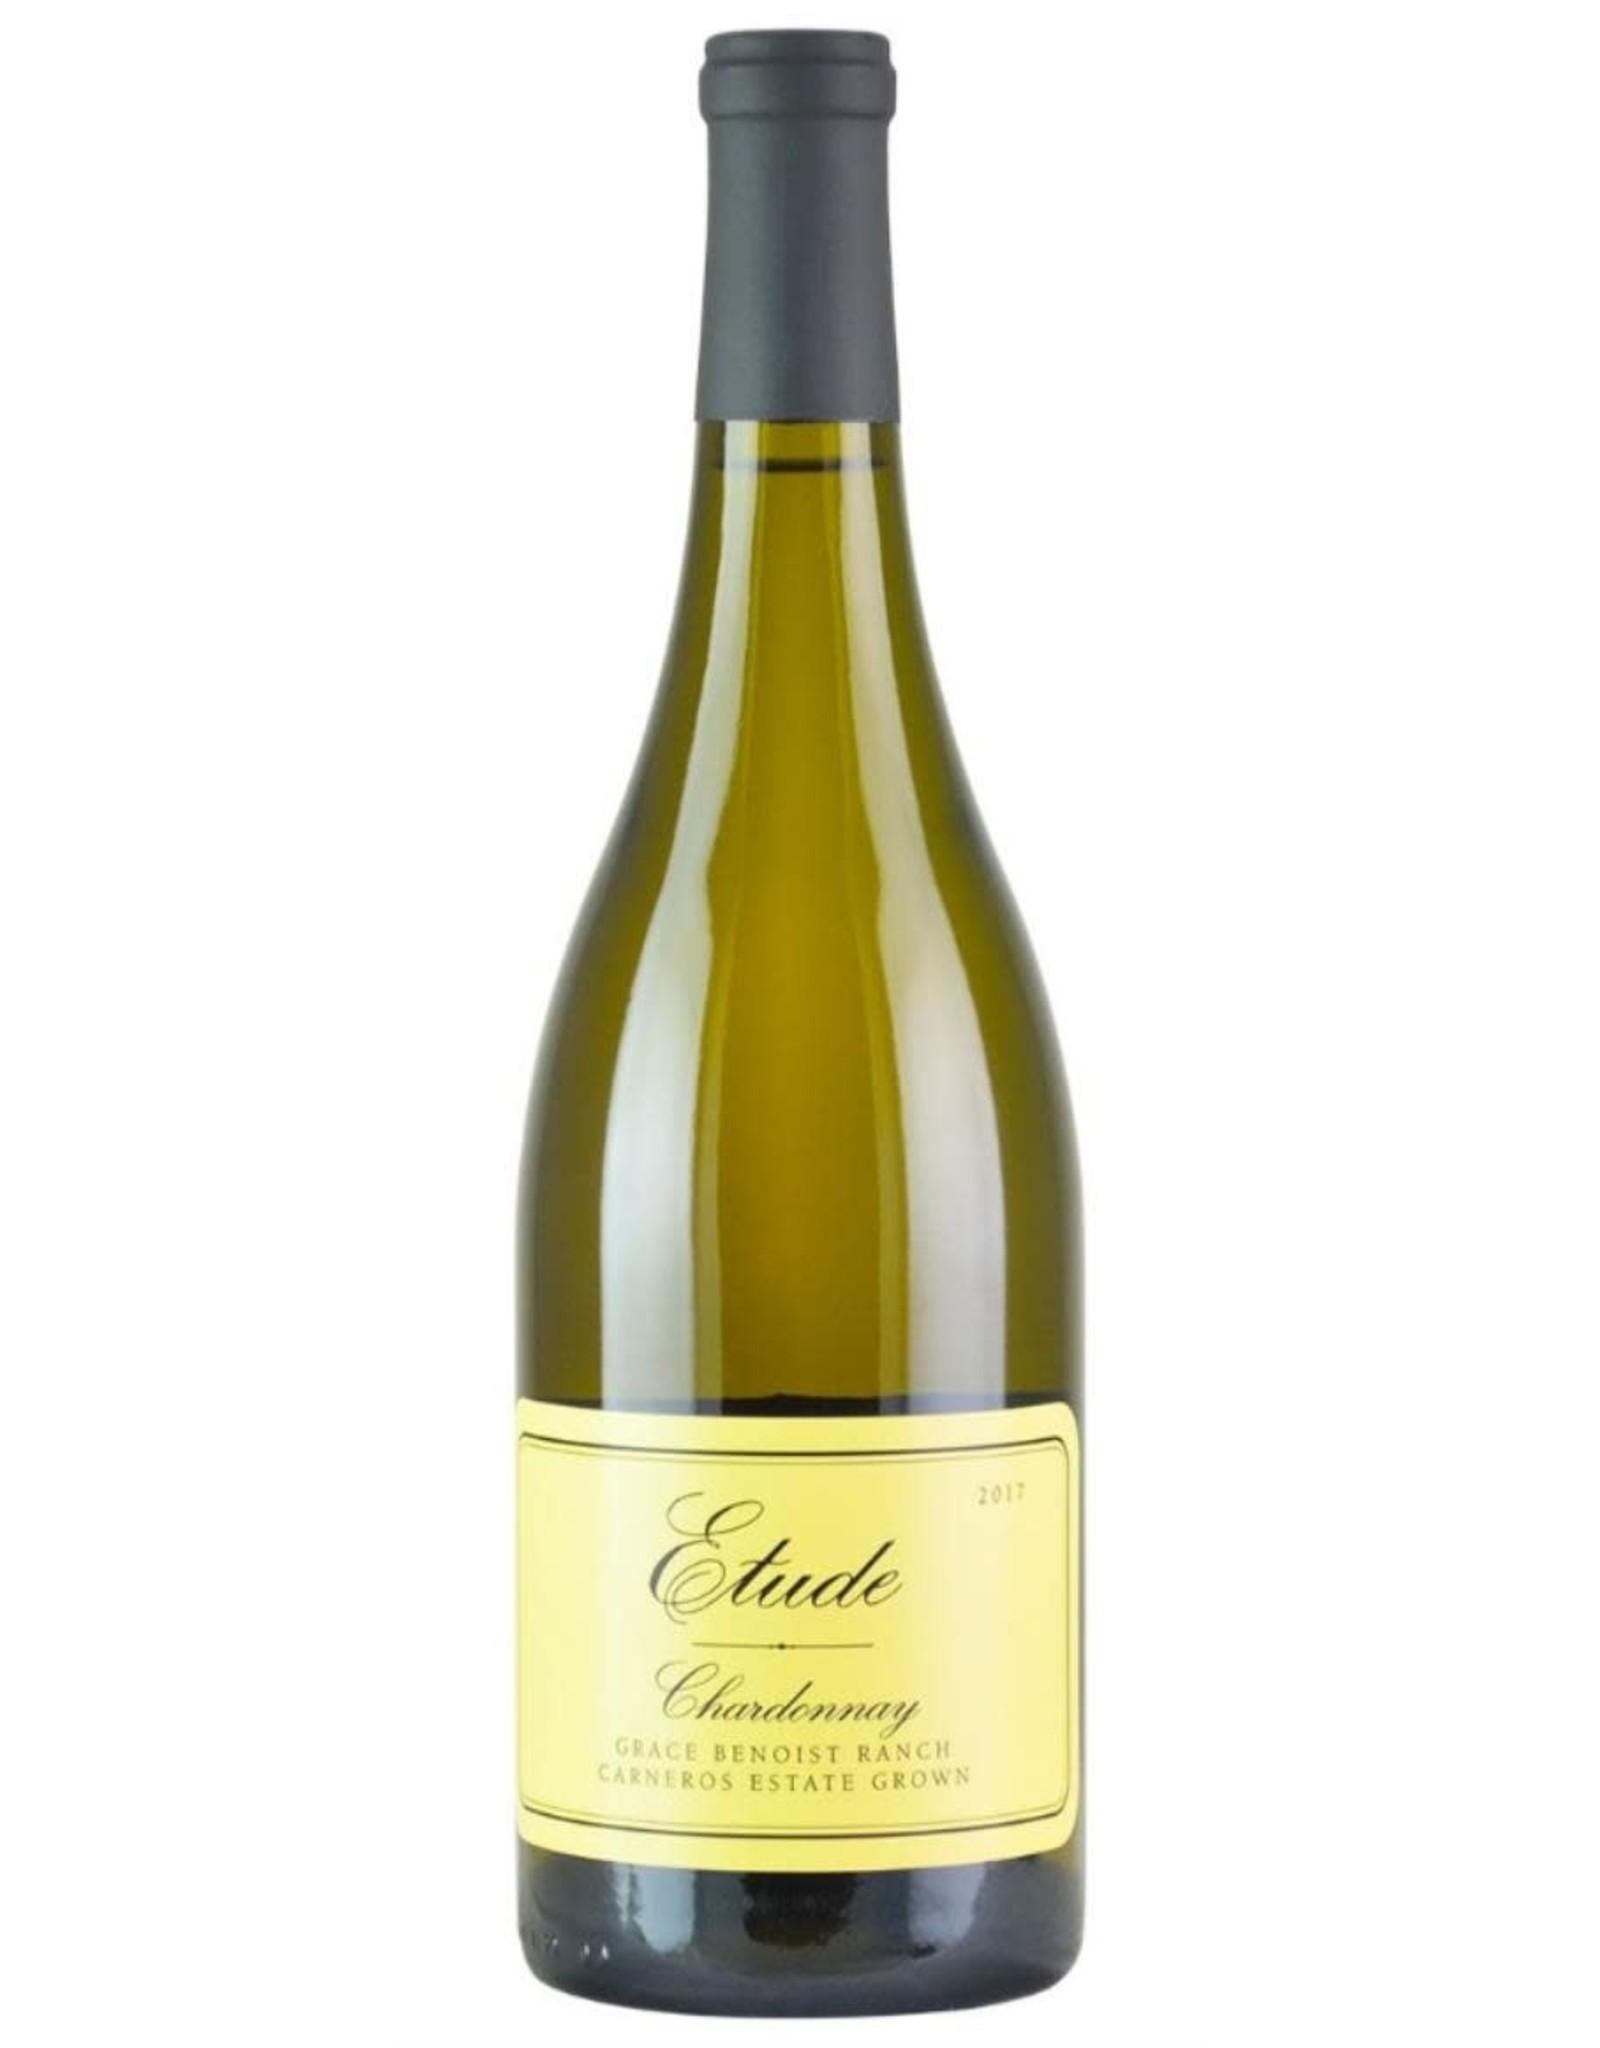 Etude Etude Chardonnay, Carneros 2017